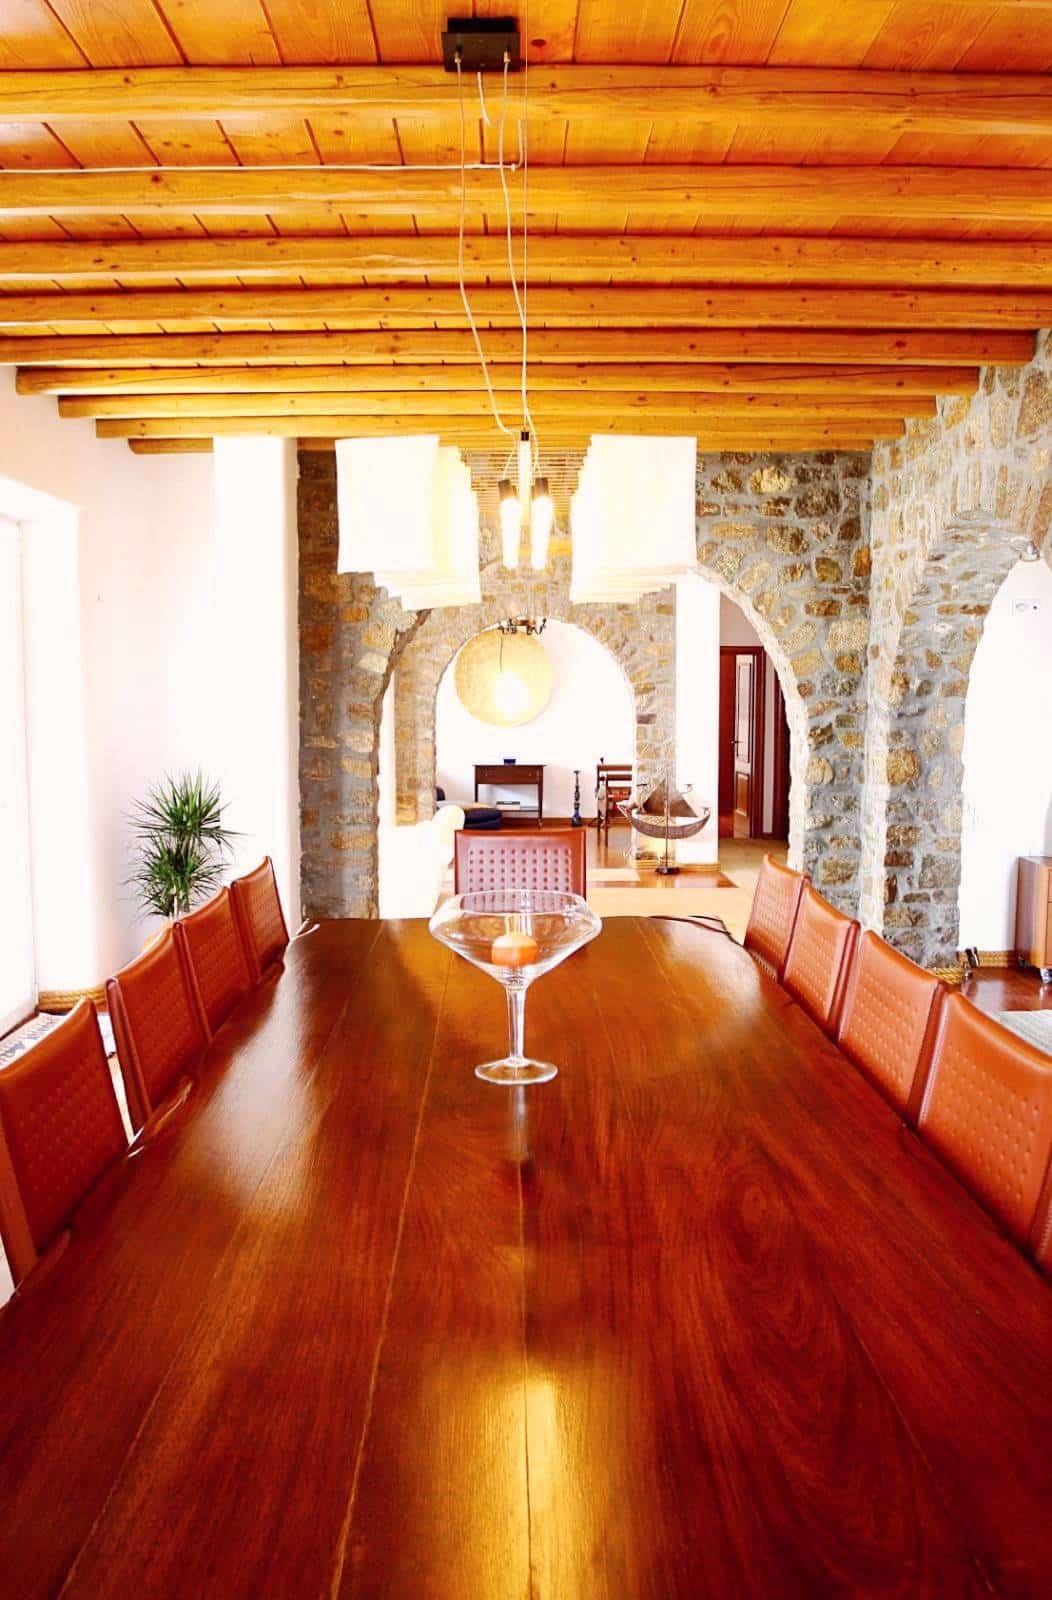 luxurious villa Mykonos - πολυτελής βίλα Μύκονος - mykonos services - οικοδομικές εργασίες 19